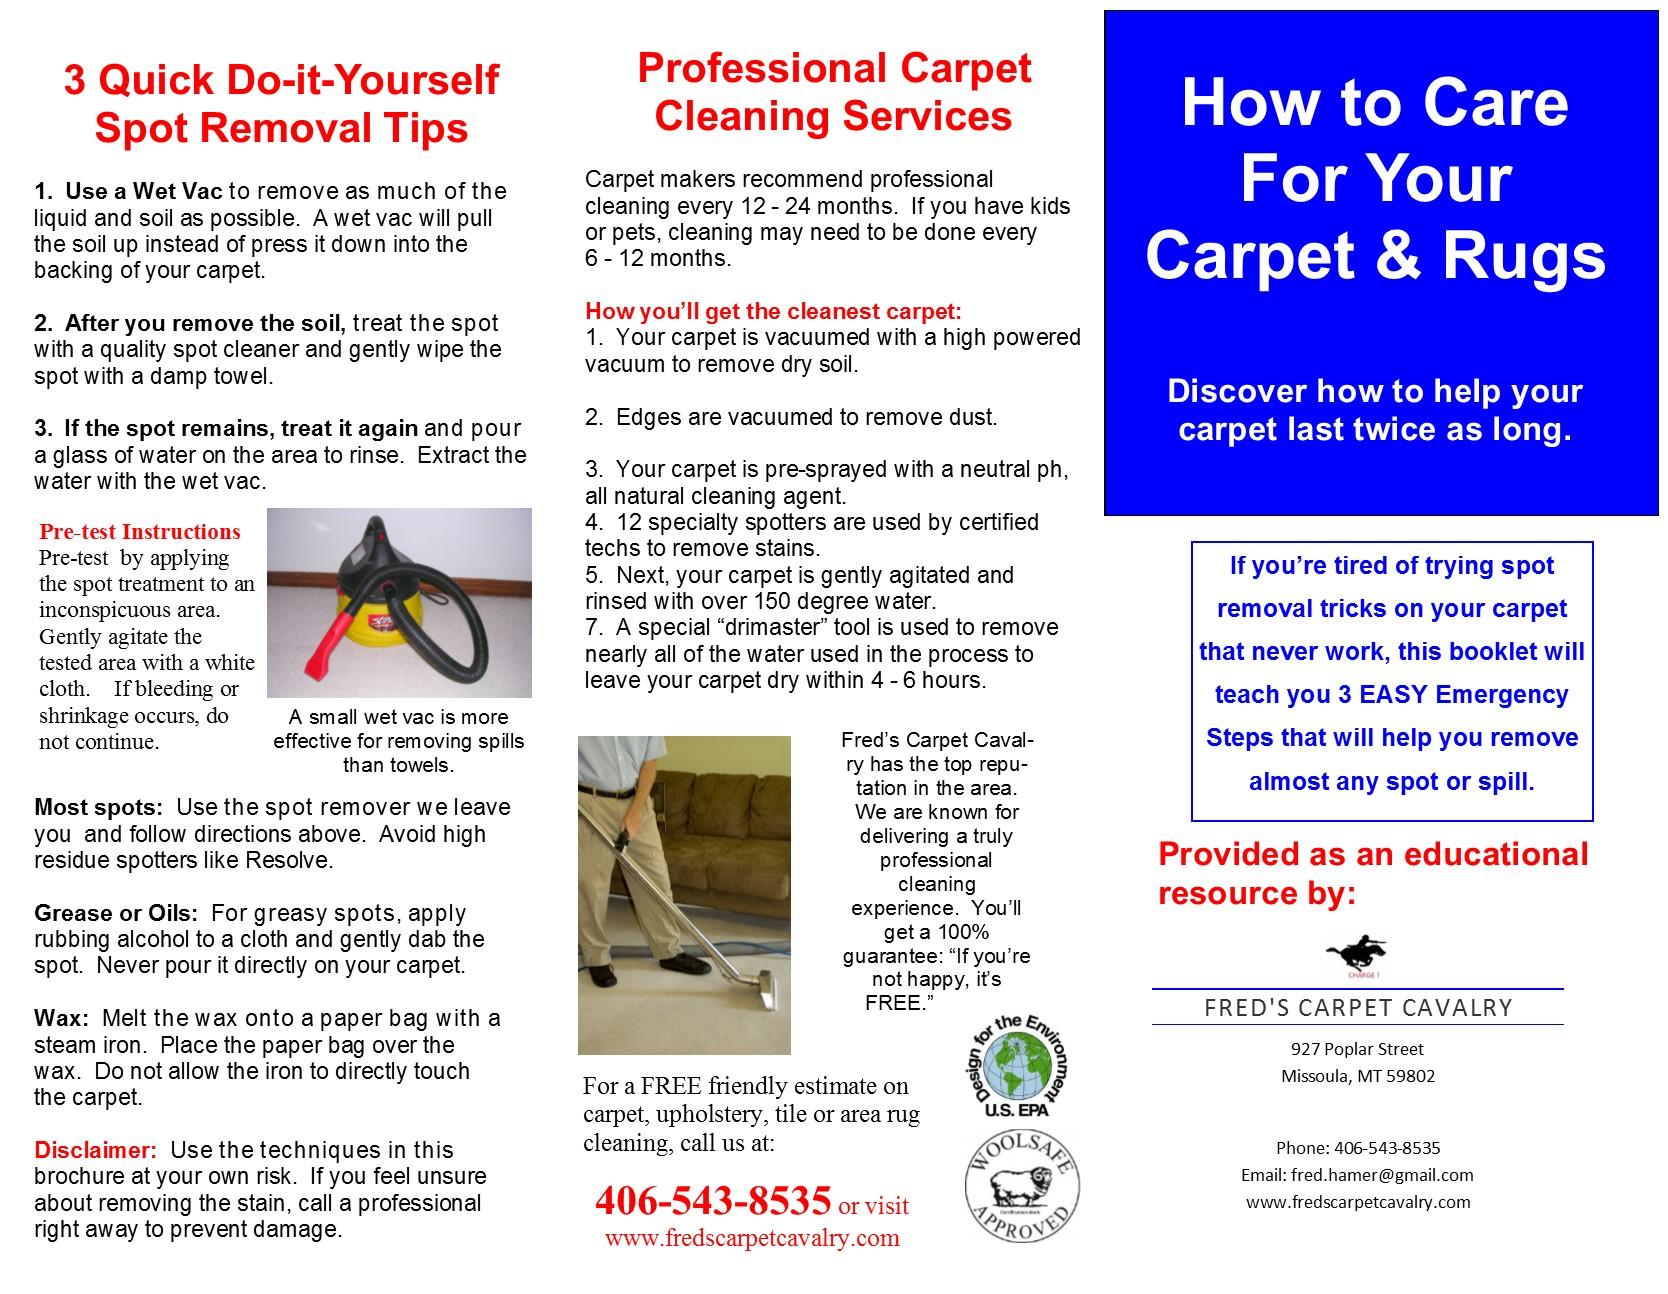 How to care for your carpet rugs carpet cleaning in missoula carpet rug cleaning tips for missoula mt publication3 brochure8142013 solutioingenieria Images